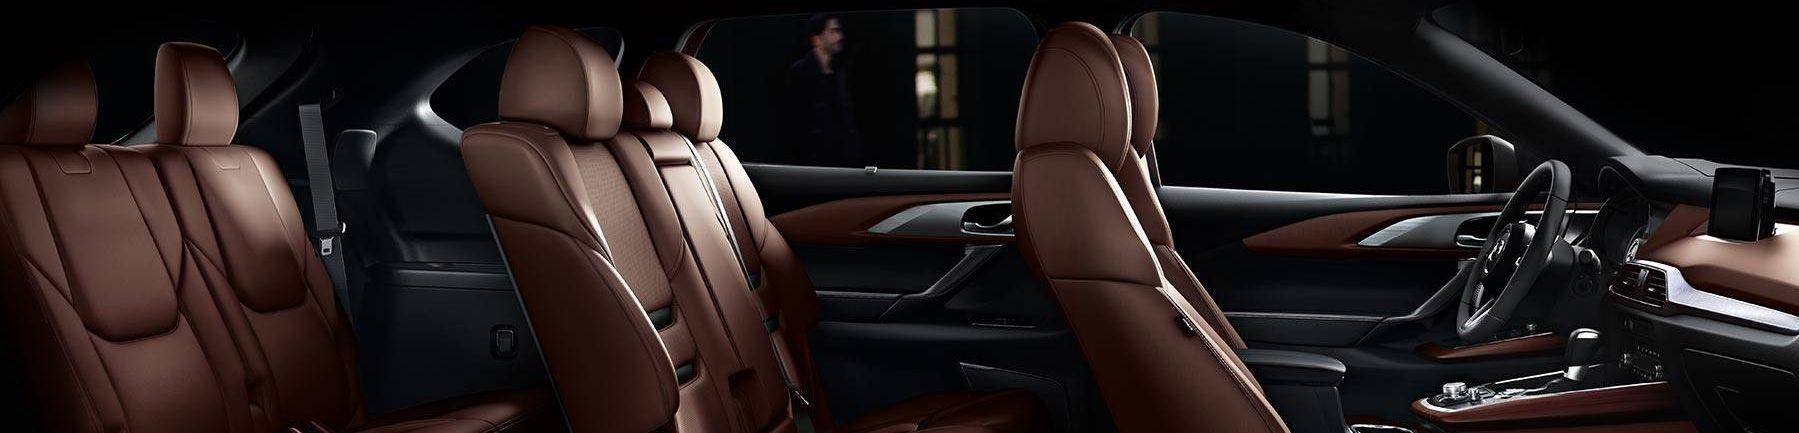 2019 Mazda CX-9 Seating